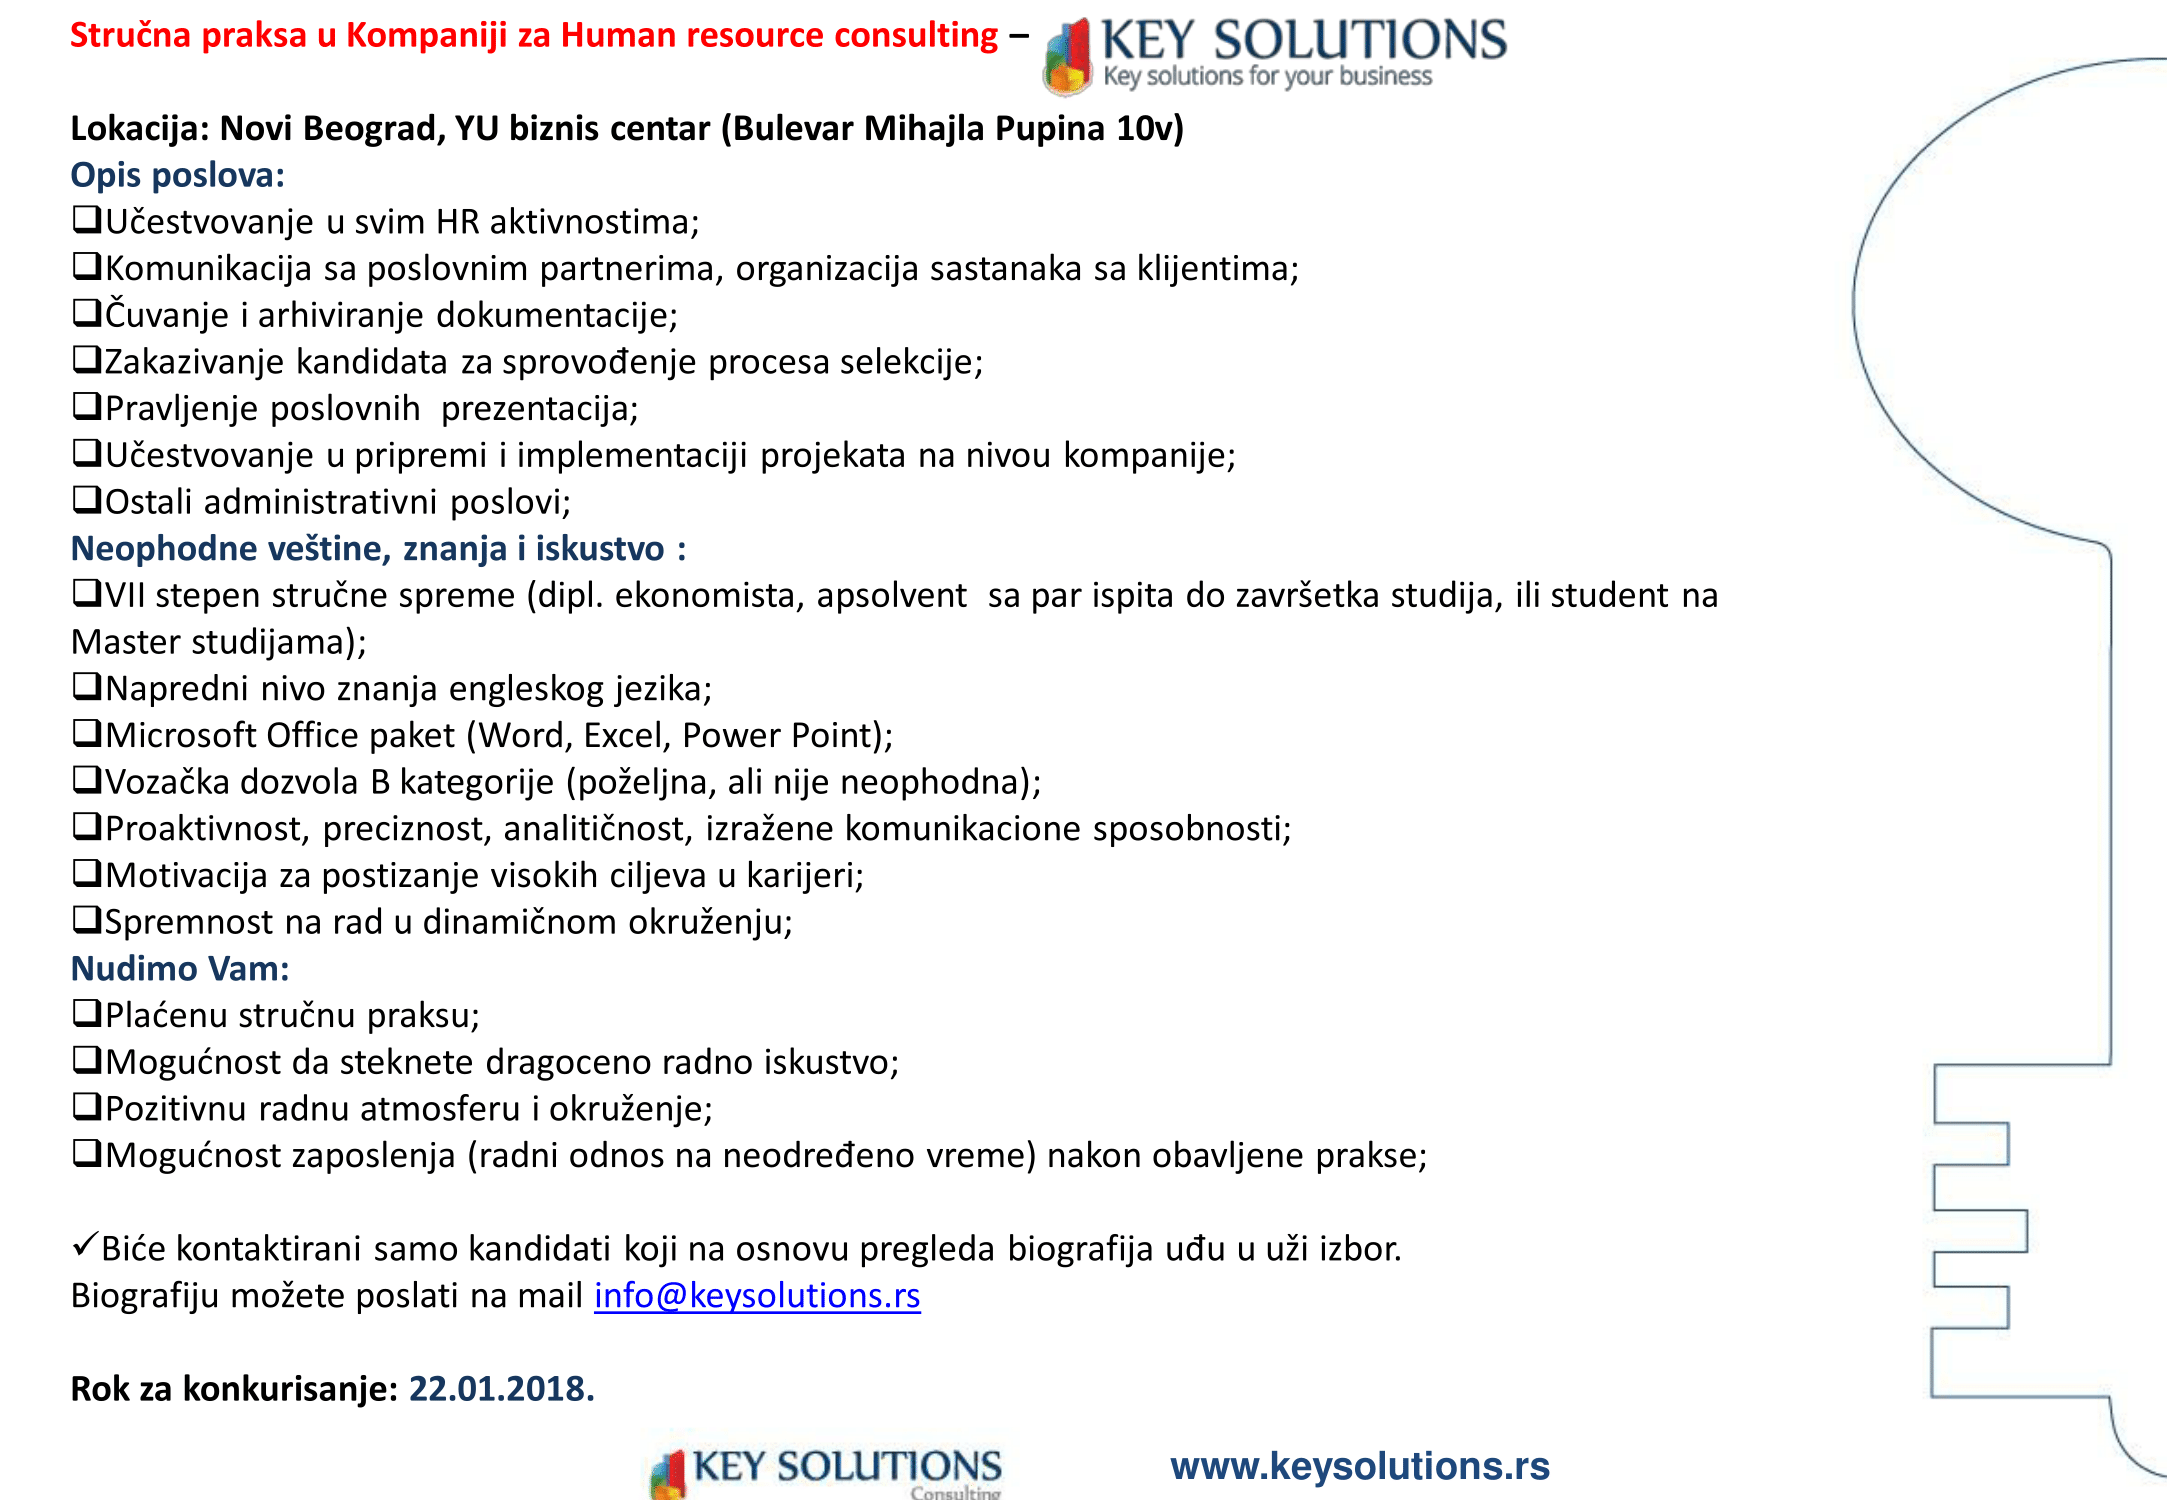 Oglas za Stručnu praksu-Key Solutions Consulting-1